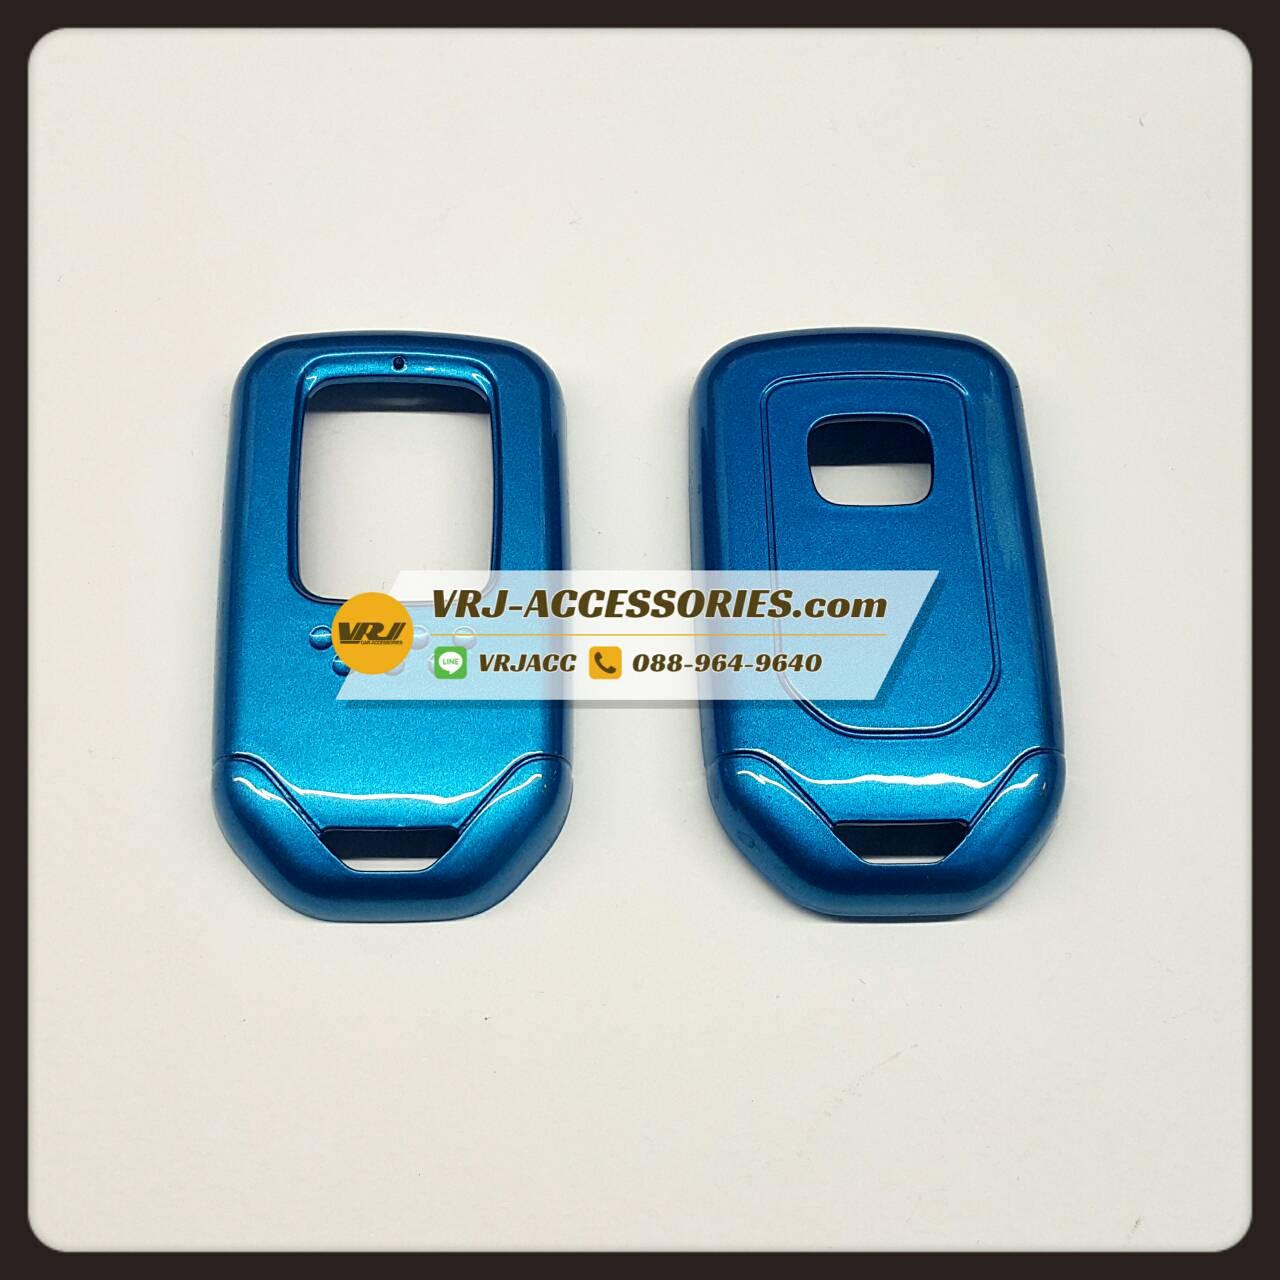 VJ2742 กรอบใส่รีโมทรถยนต์ CASE แข็งหุ้มรีโมท smart key 2 ปุ่ม ฮอนด้า เอชอาวี บีอาวี ซีอาวี แจซ : Hard case cover for cars - Honda HRV BRV CRV Jazz